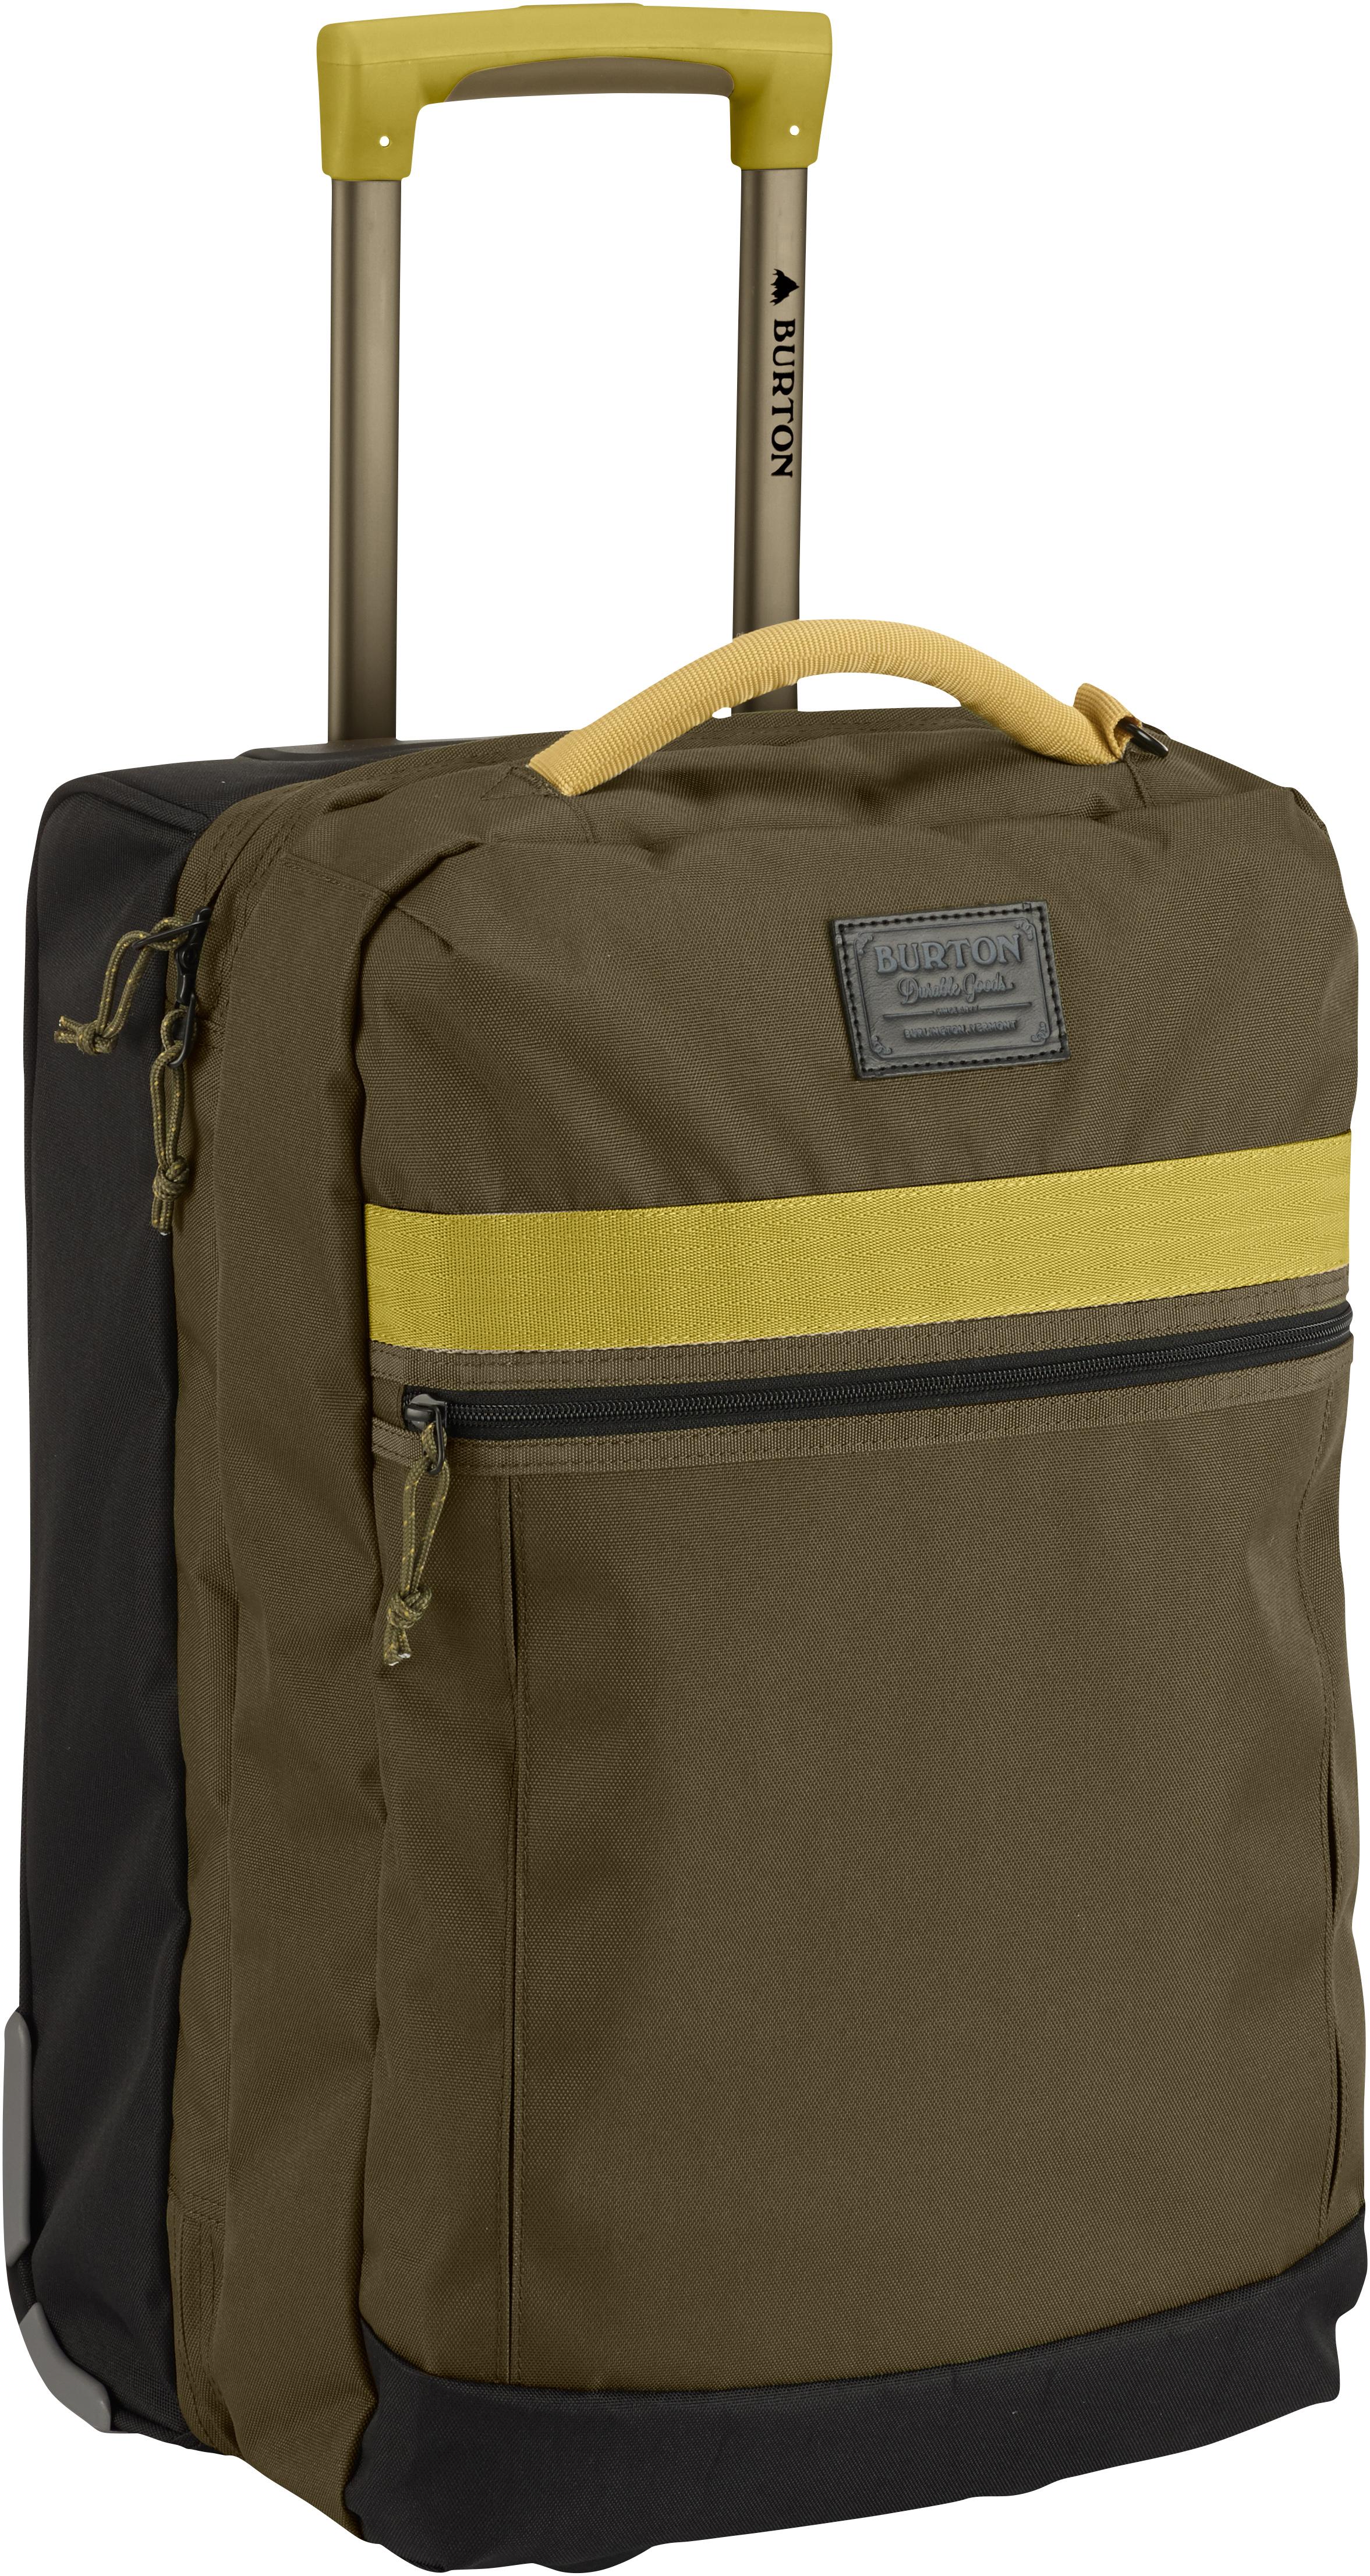 a56157579451 Burton Convoy Roller Travel Bag Review | Building Materials Bargain ...